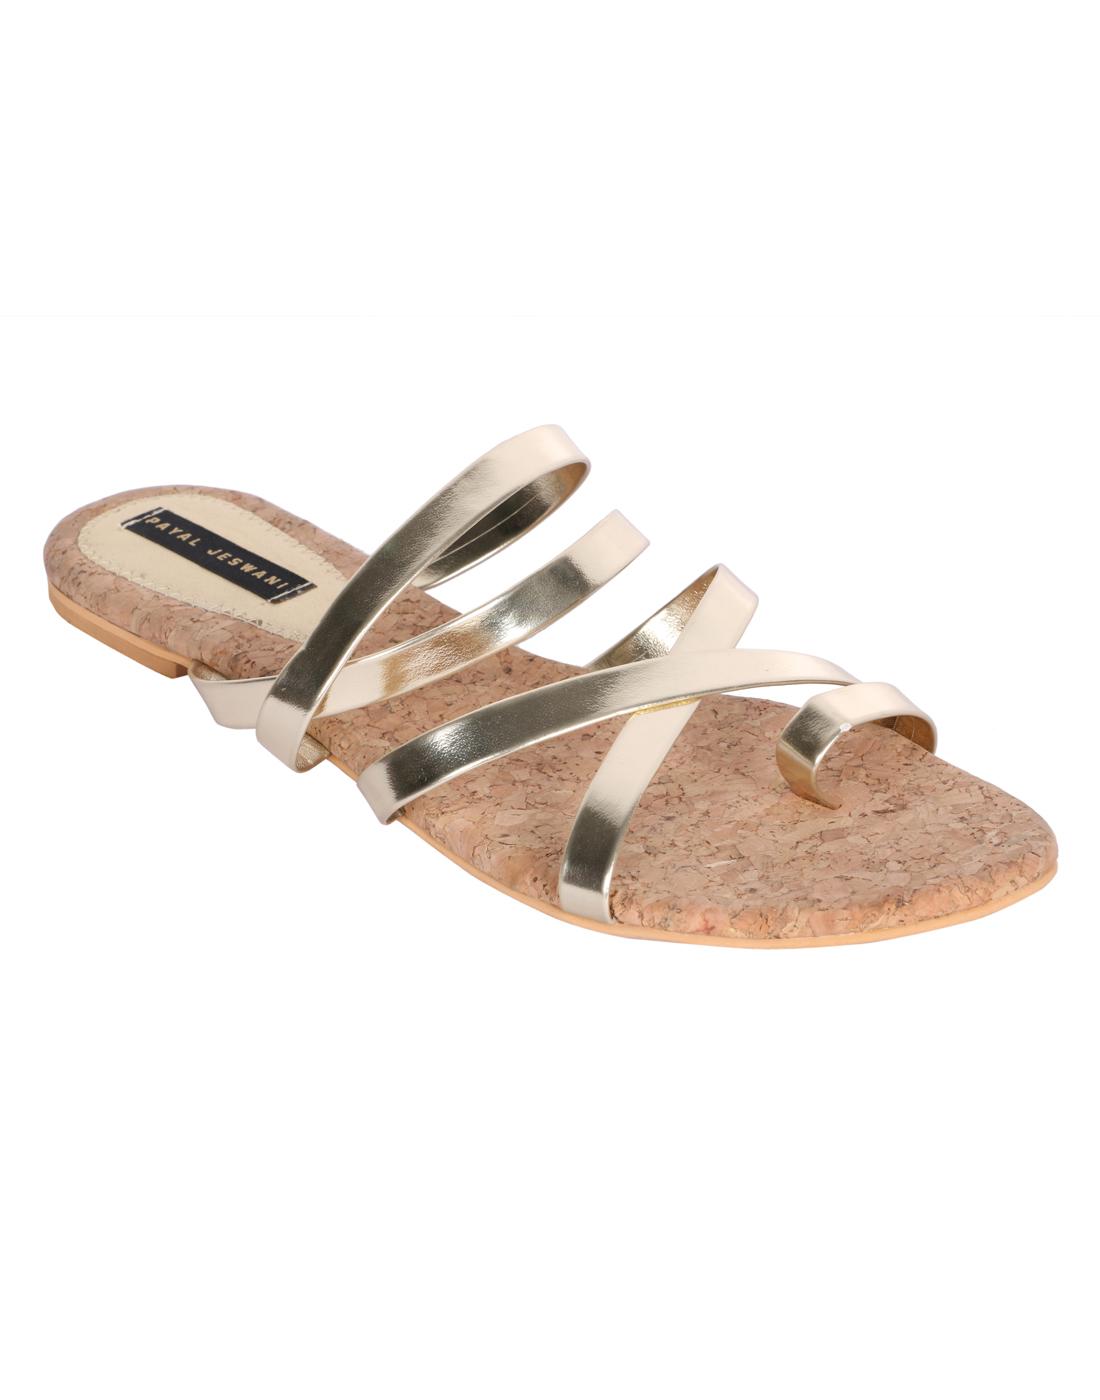 PAYAL JESWANI Gold Colour Casual Leather Flat Sandal